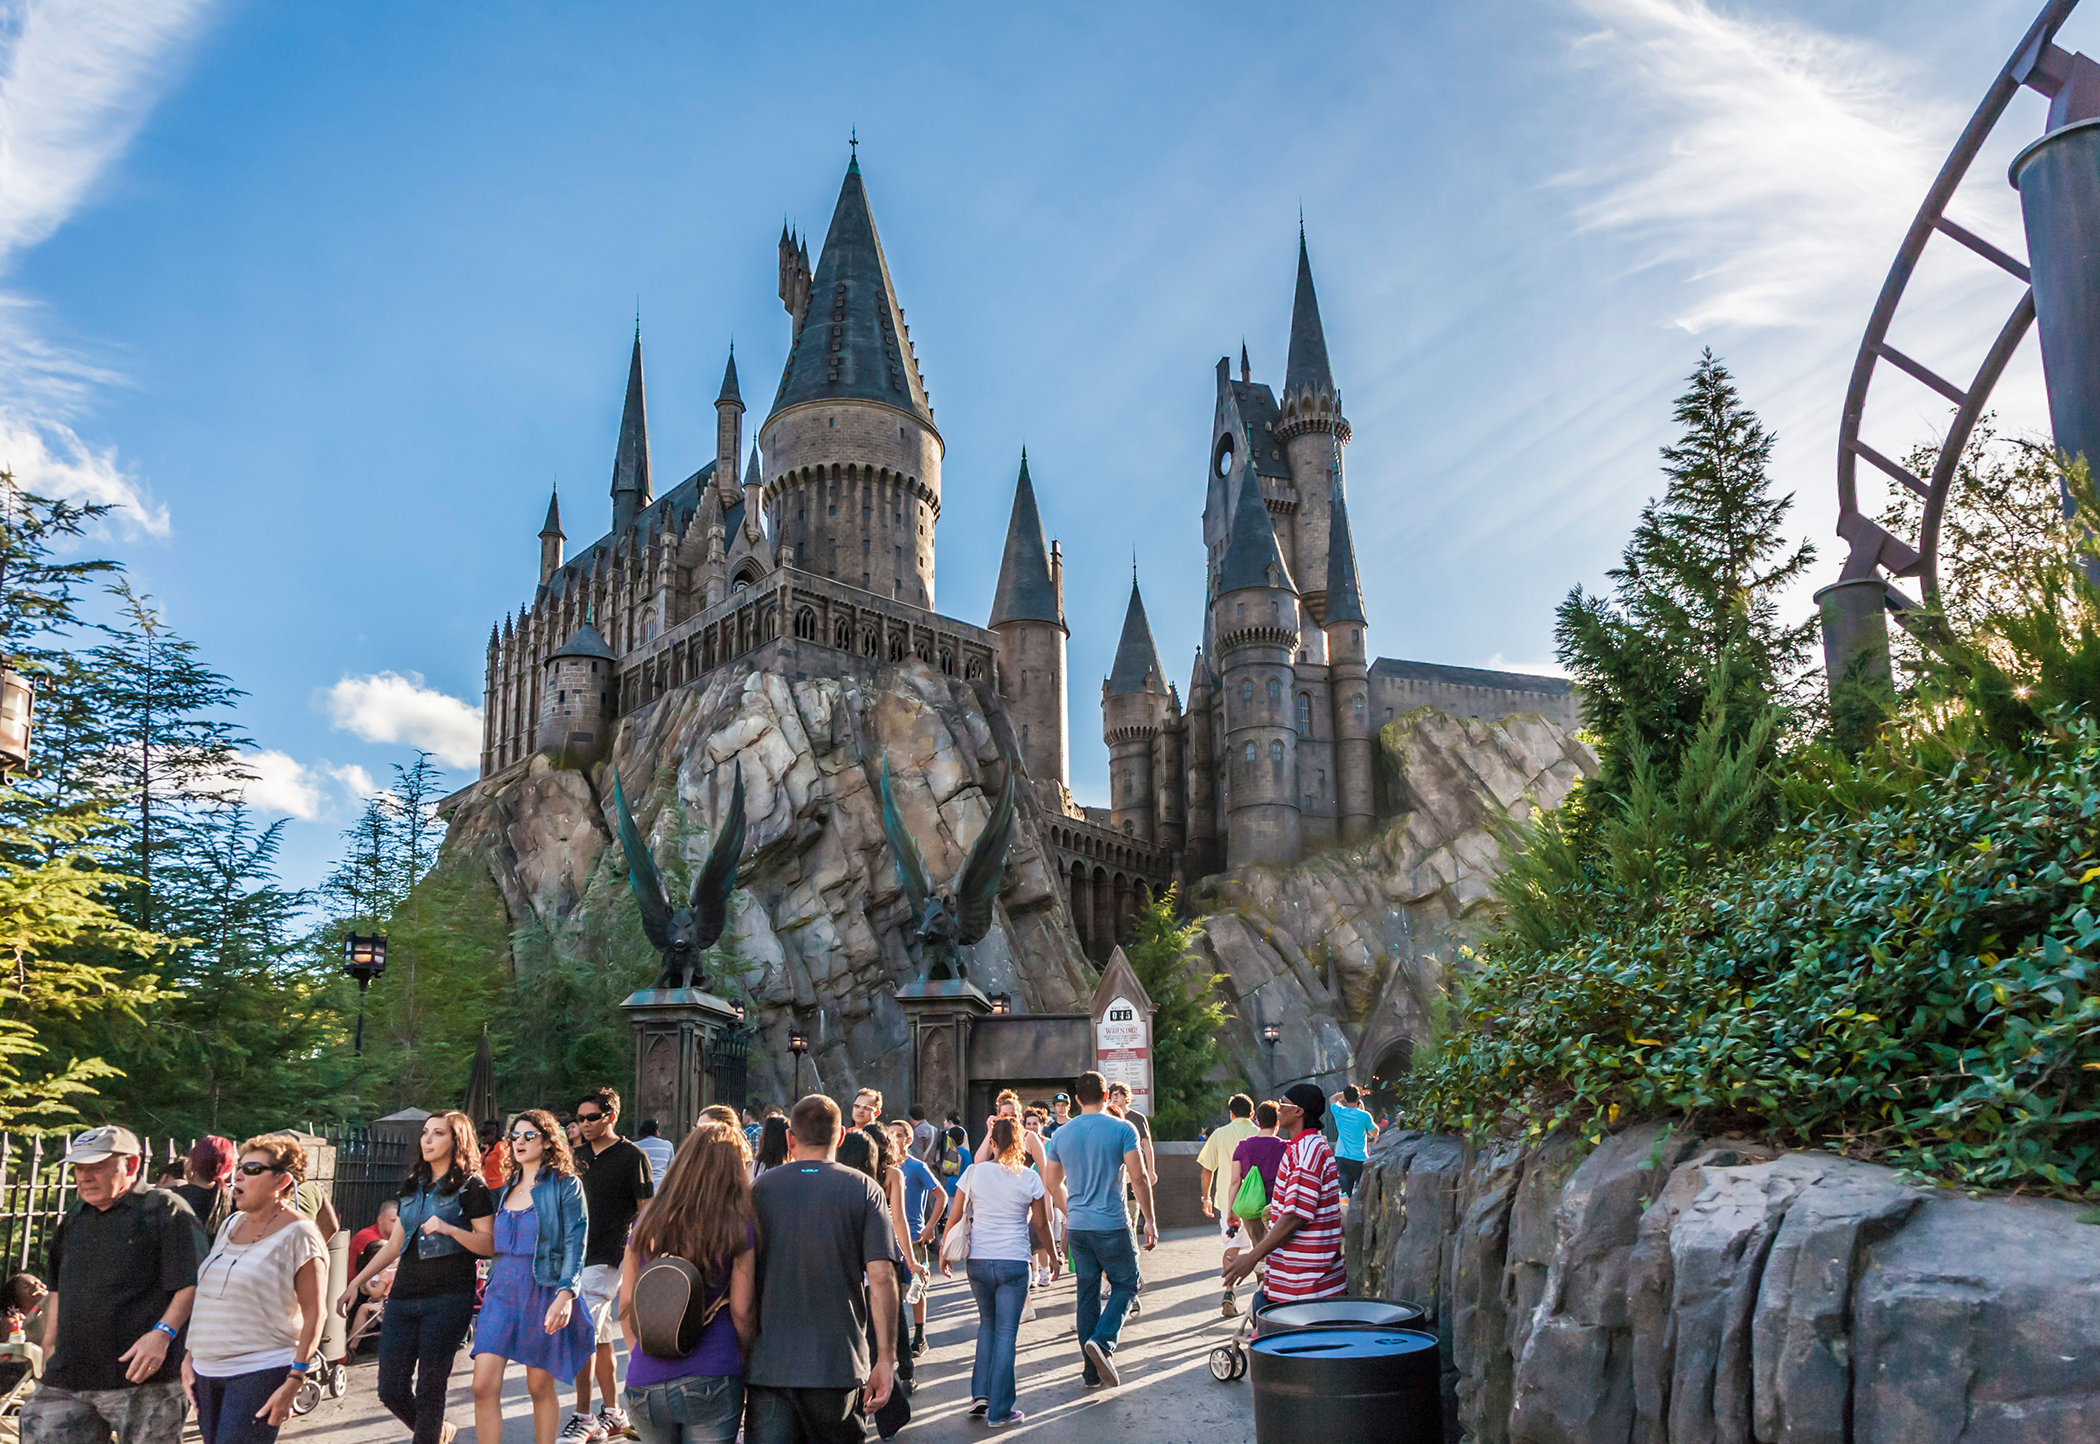 The Wizarding World of Harry Potter at Universal Studios Islands of Adventure, Orlando, FL.